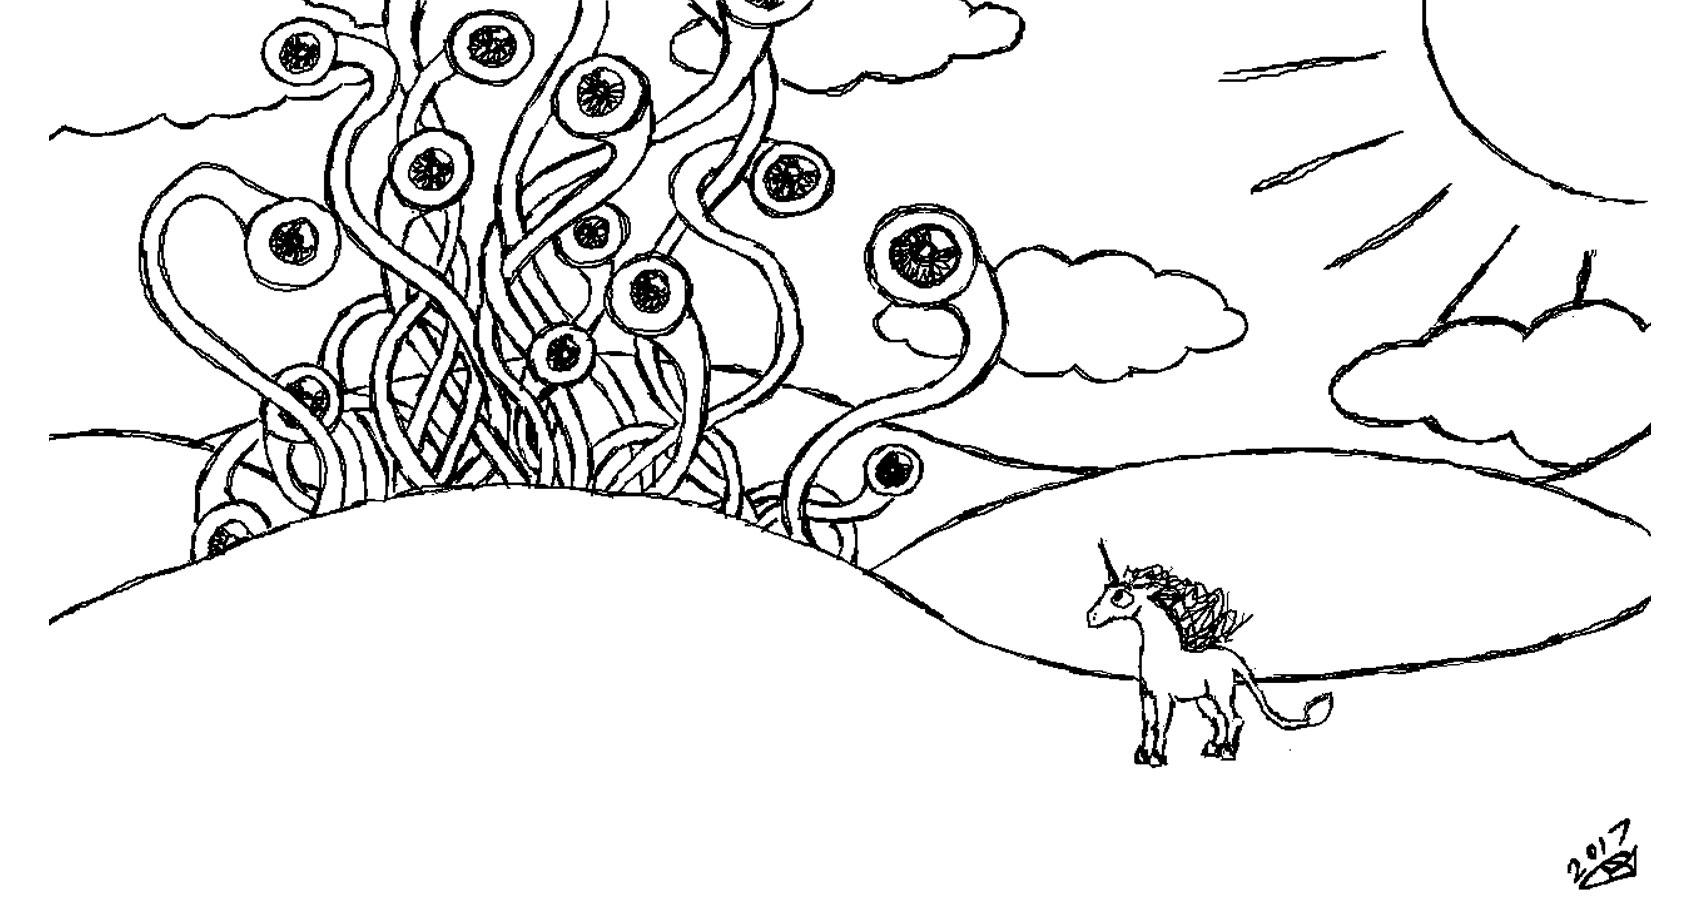 I Am A Unicorn written by Robyn MacKinnon at Spillwords.com